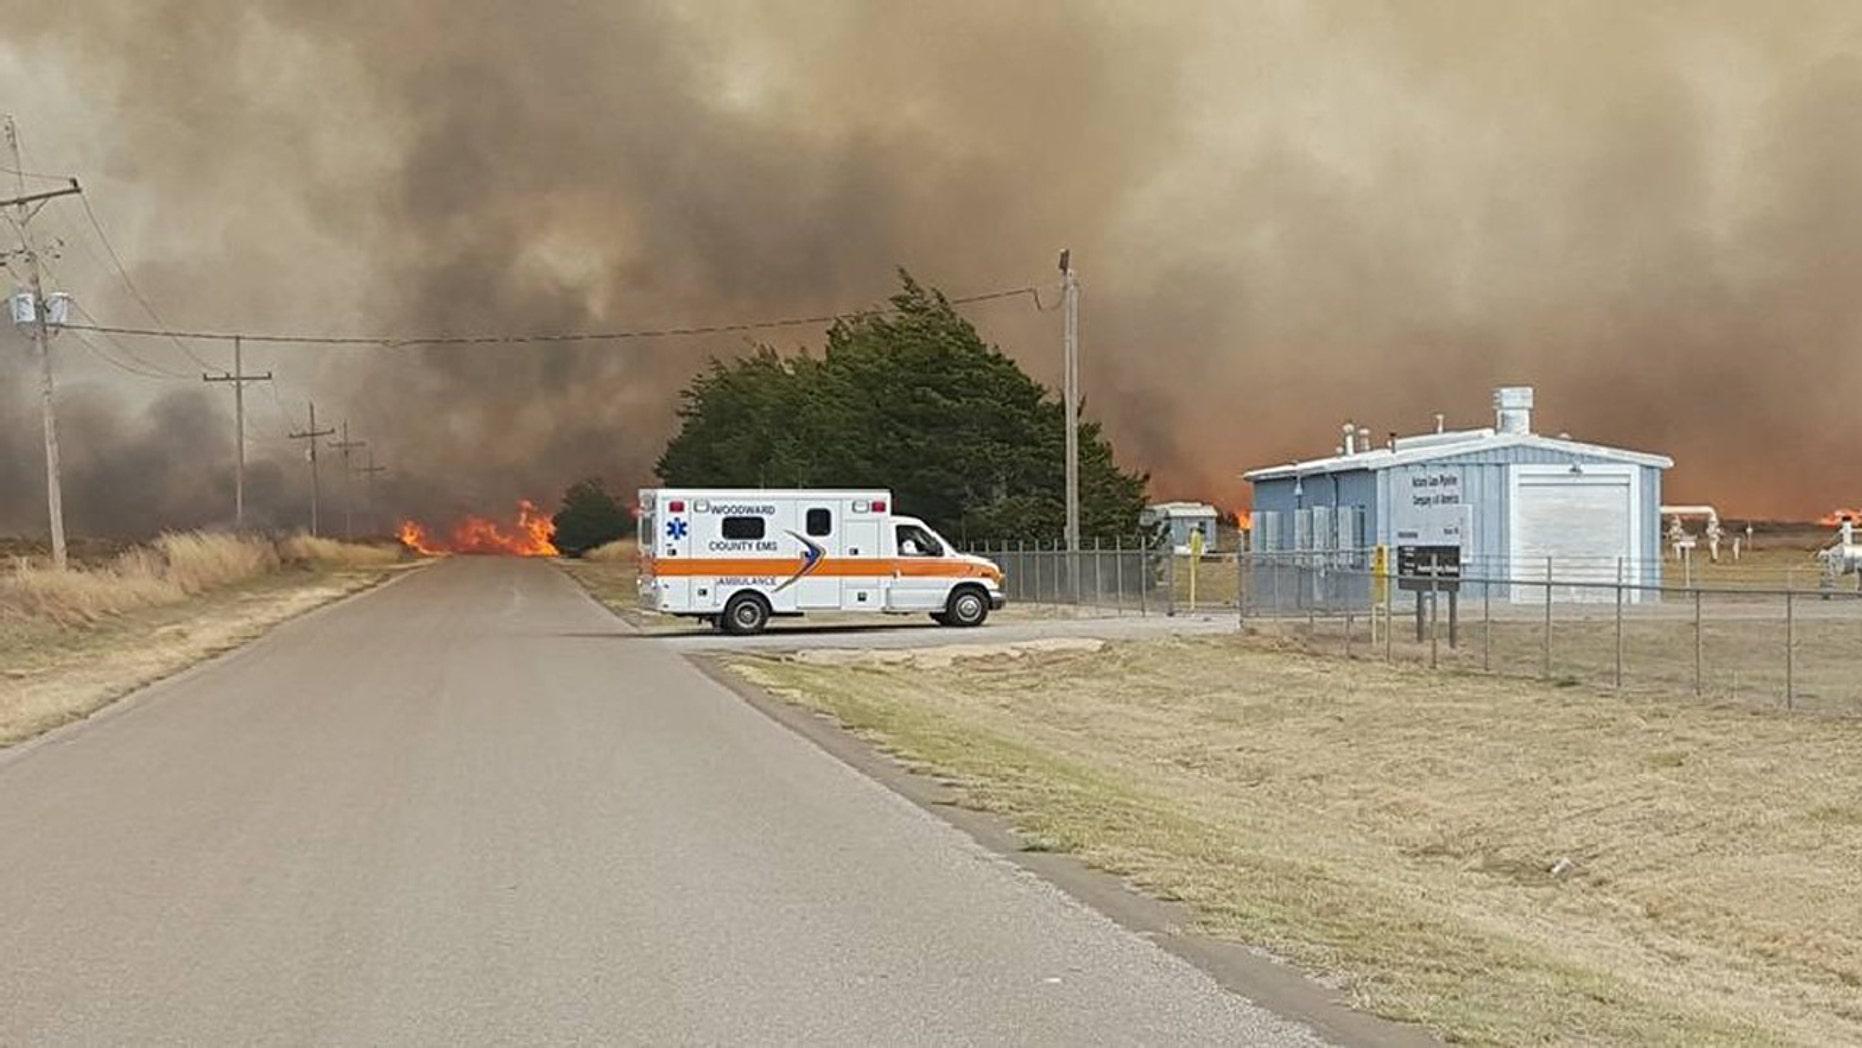 April 5, 2016: A wildfire burns near Woodward, Okla.